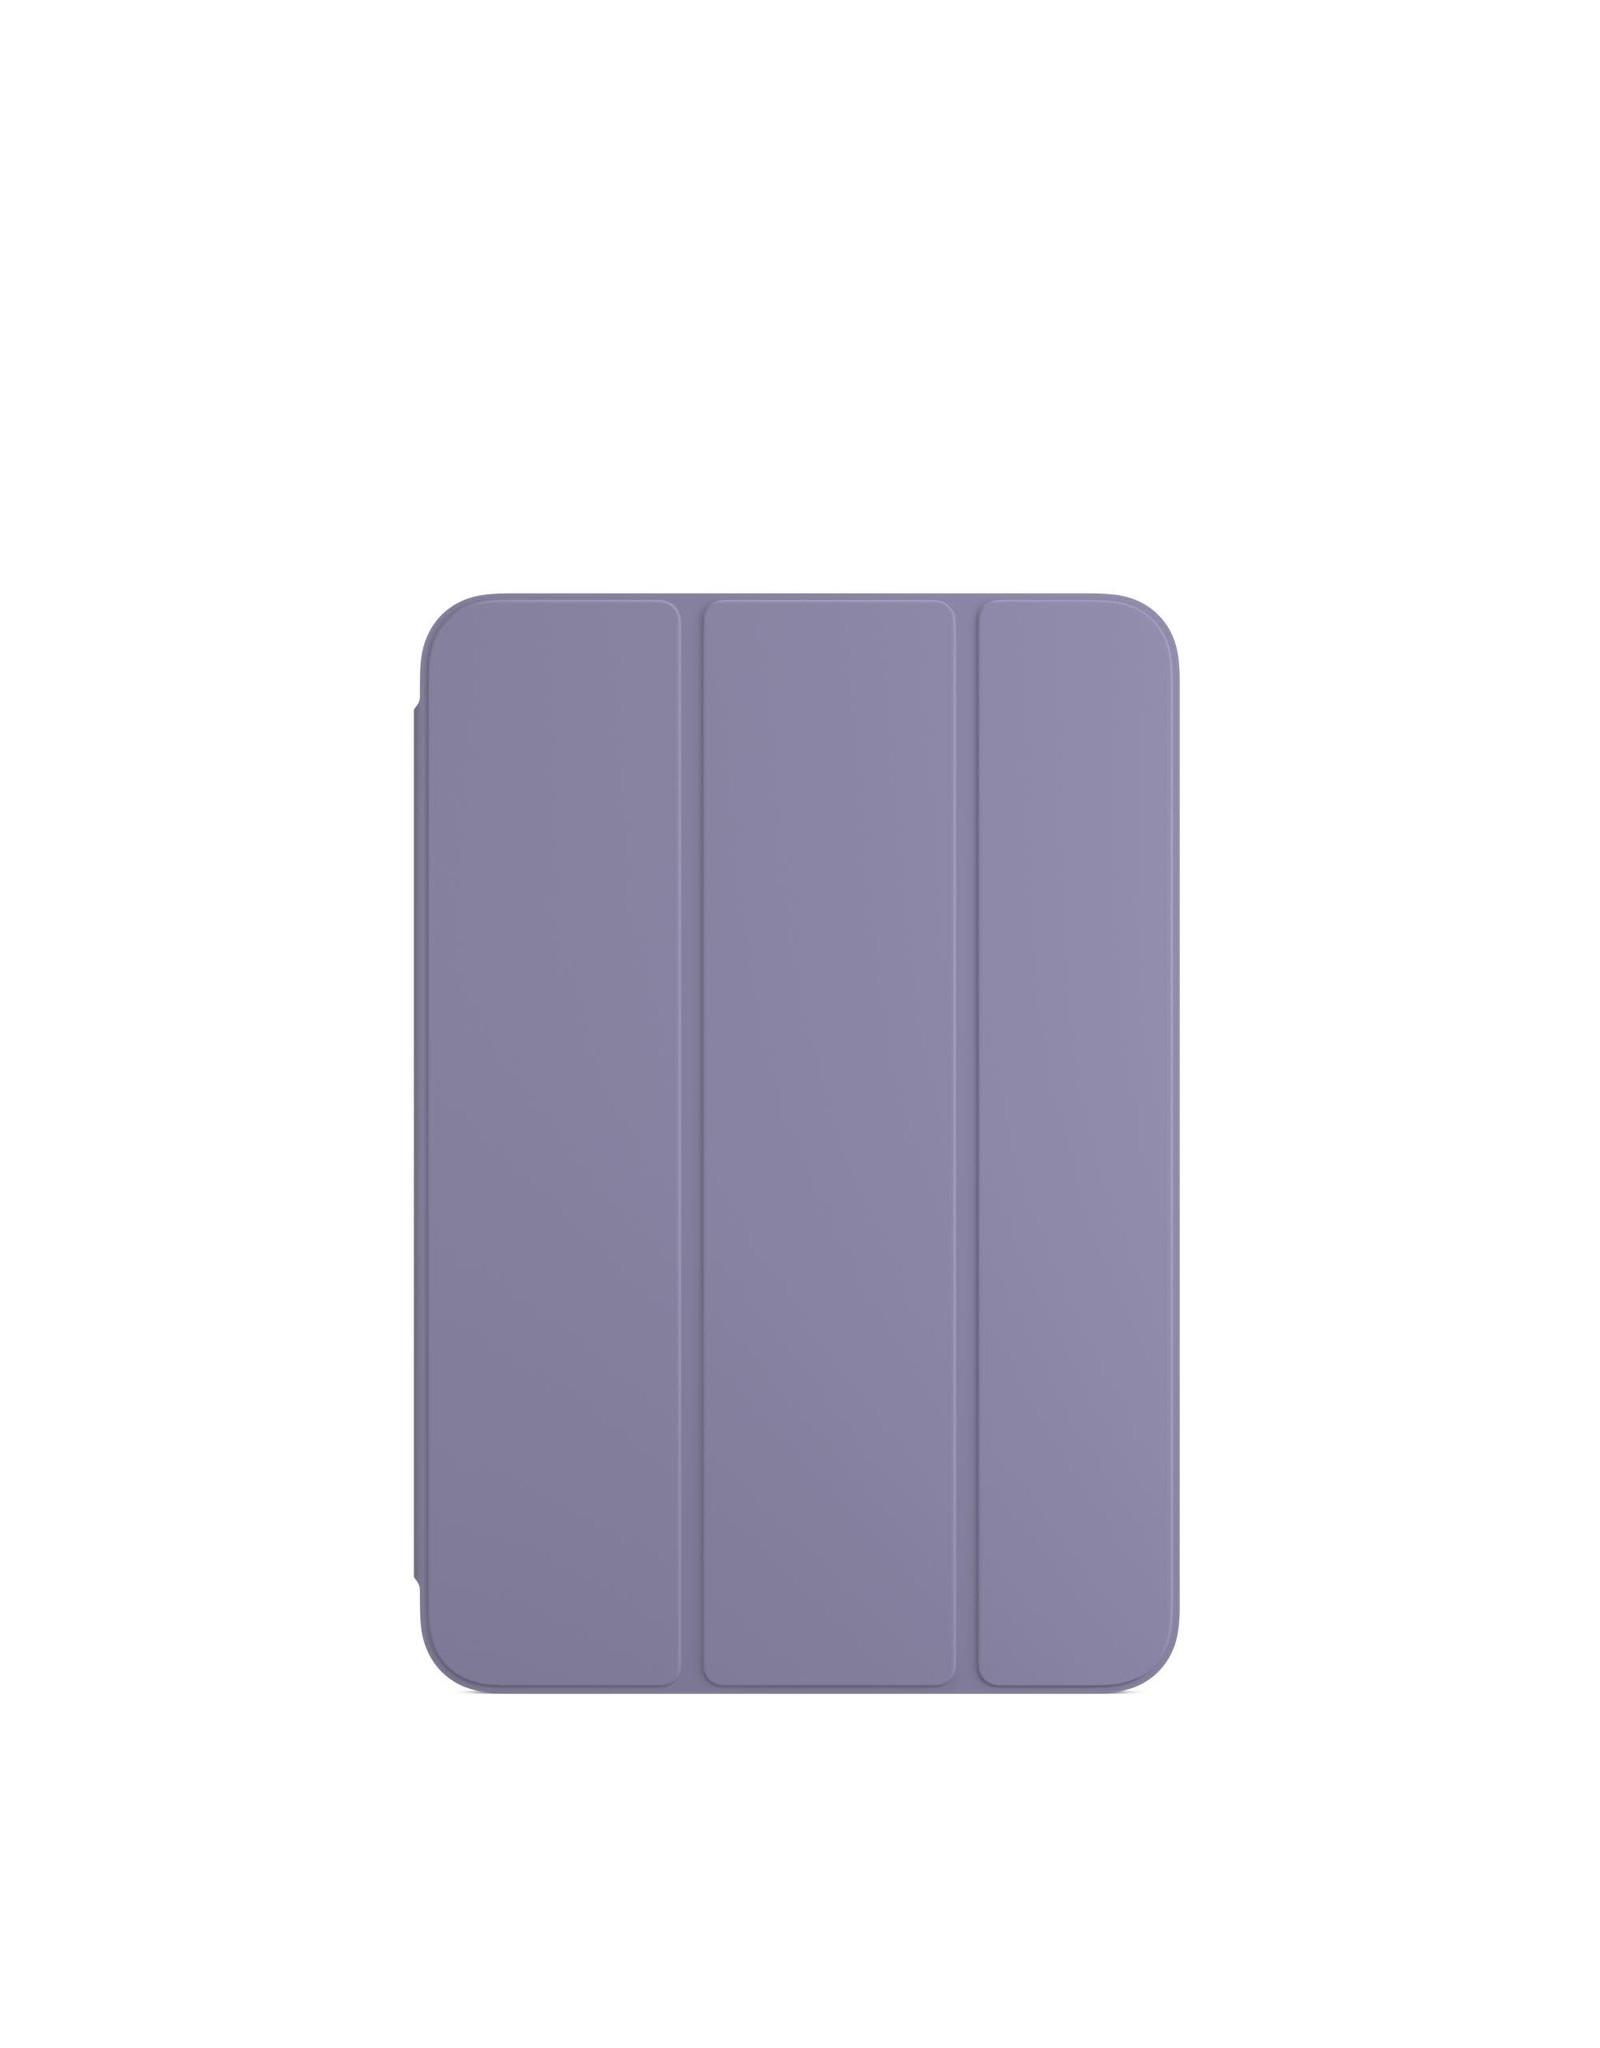 Apple Apple Smart Folio for iPad mini (6th generation) - Lavender